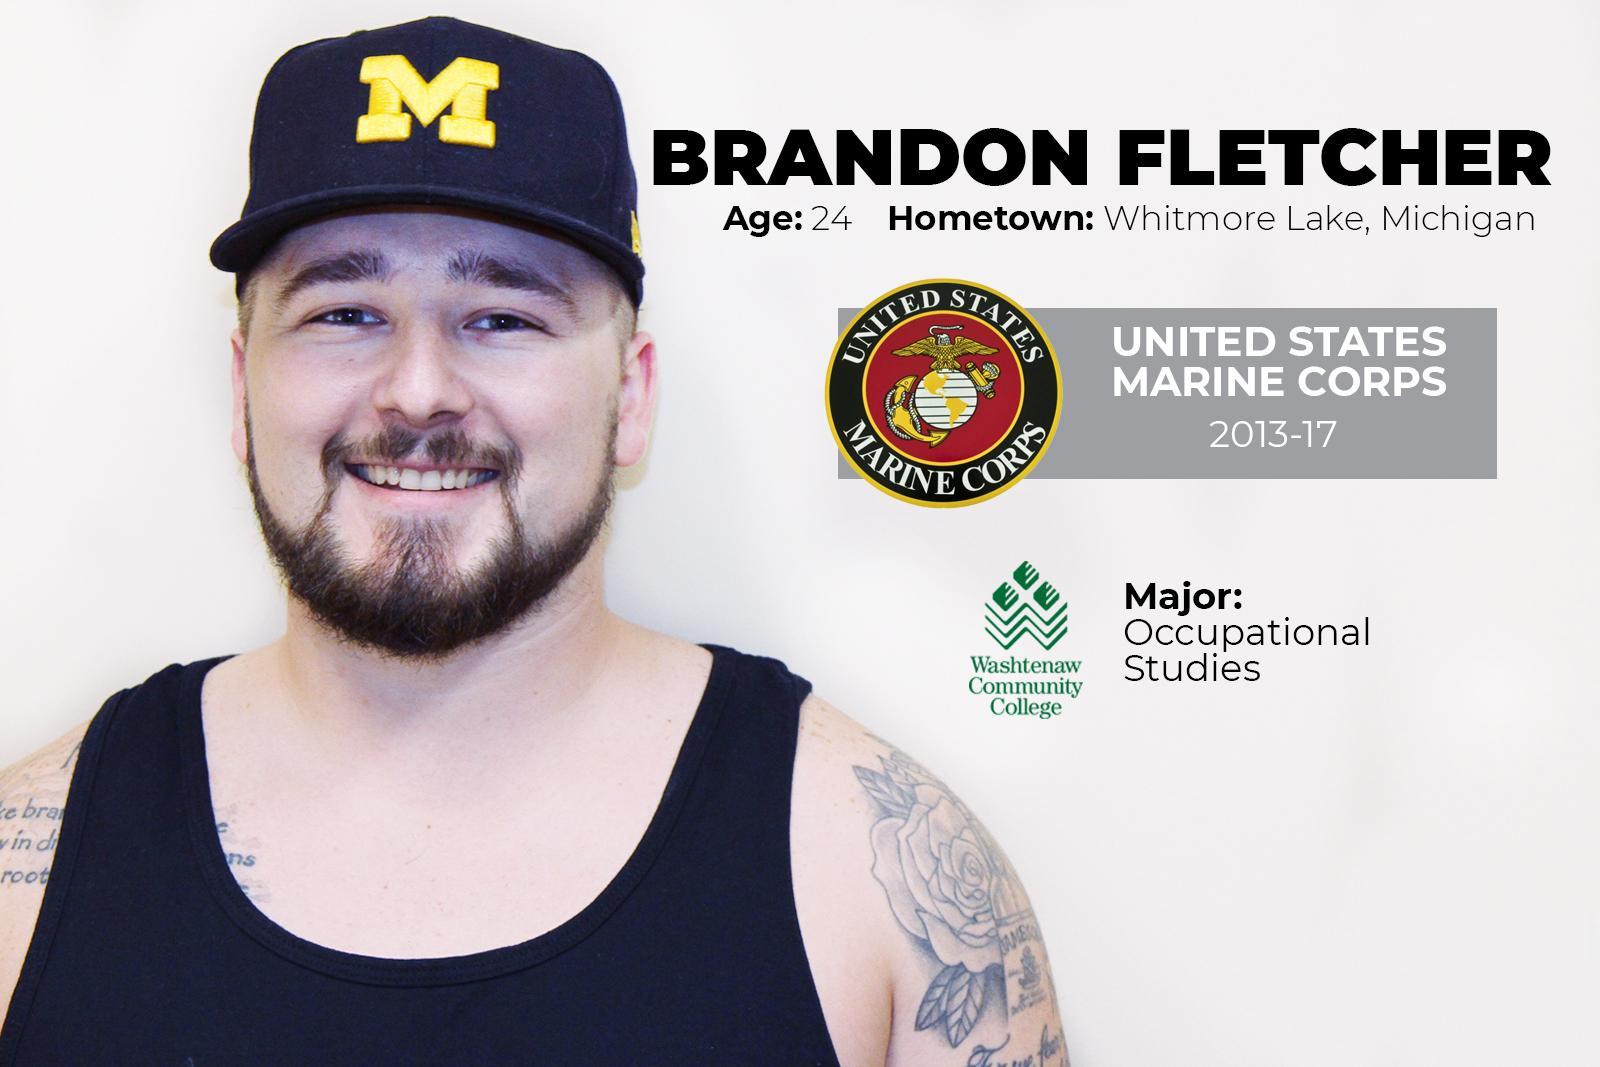 Brandon Fletcher